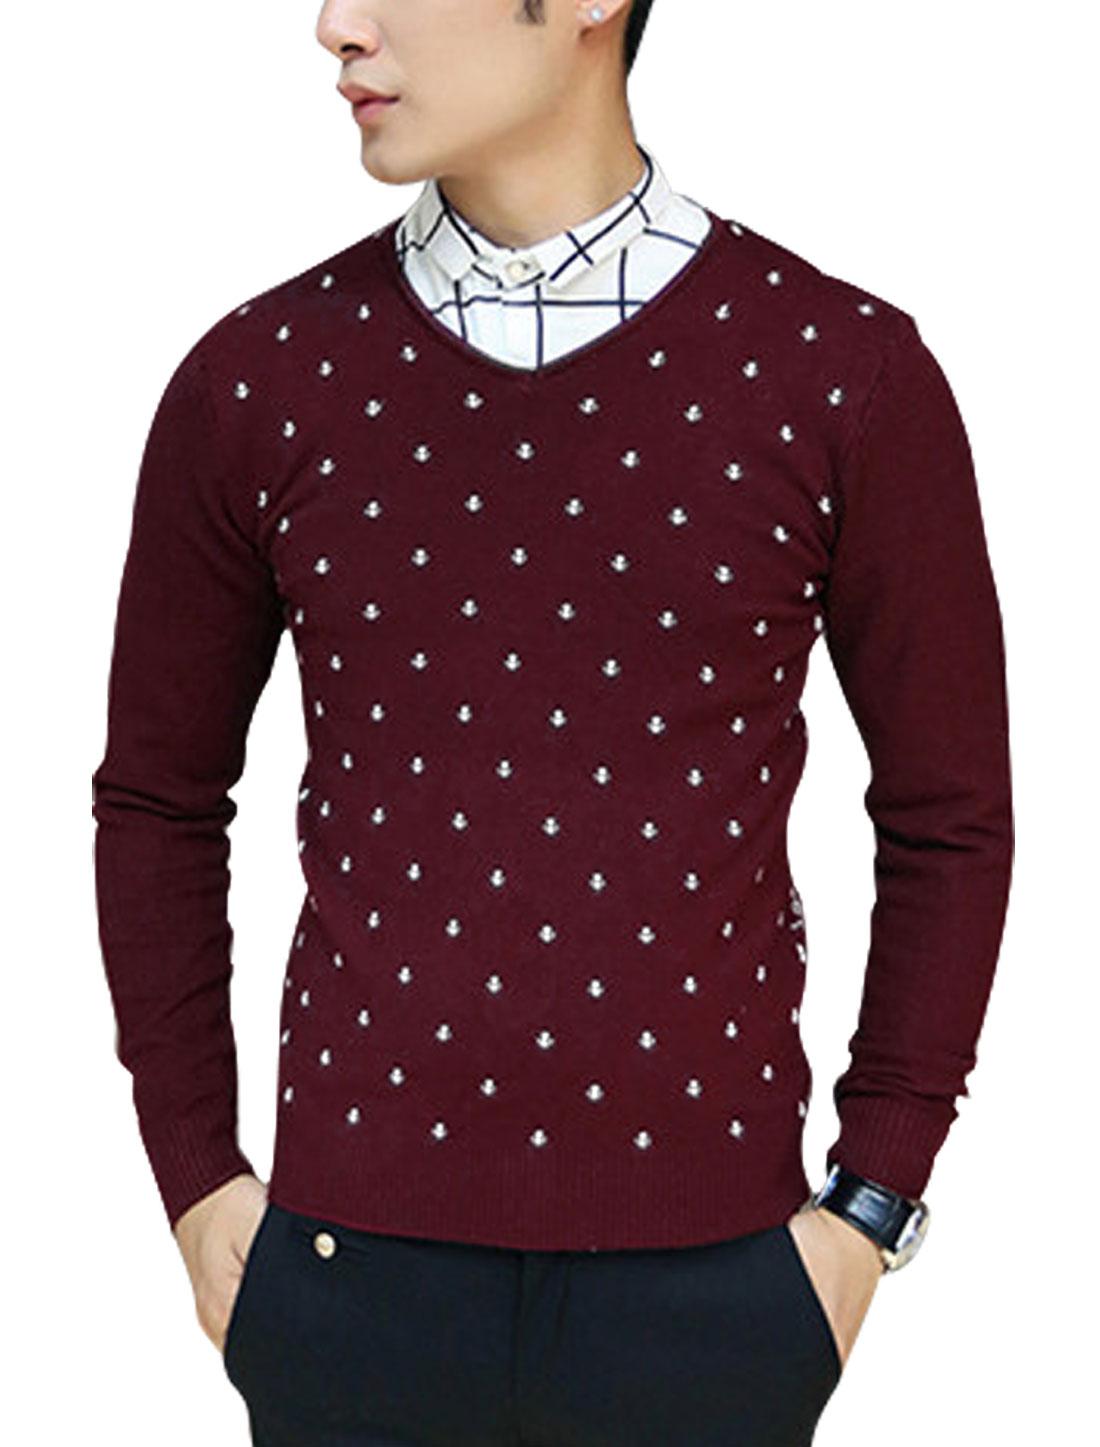 Men V Neck Long Sleeve Anchor Checks Pattern Ribbed Trim Knit Shirt Burgundy S